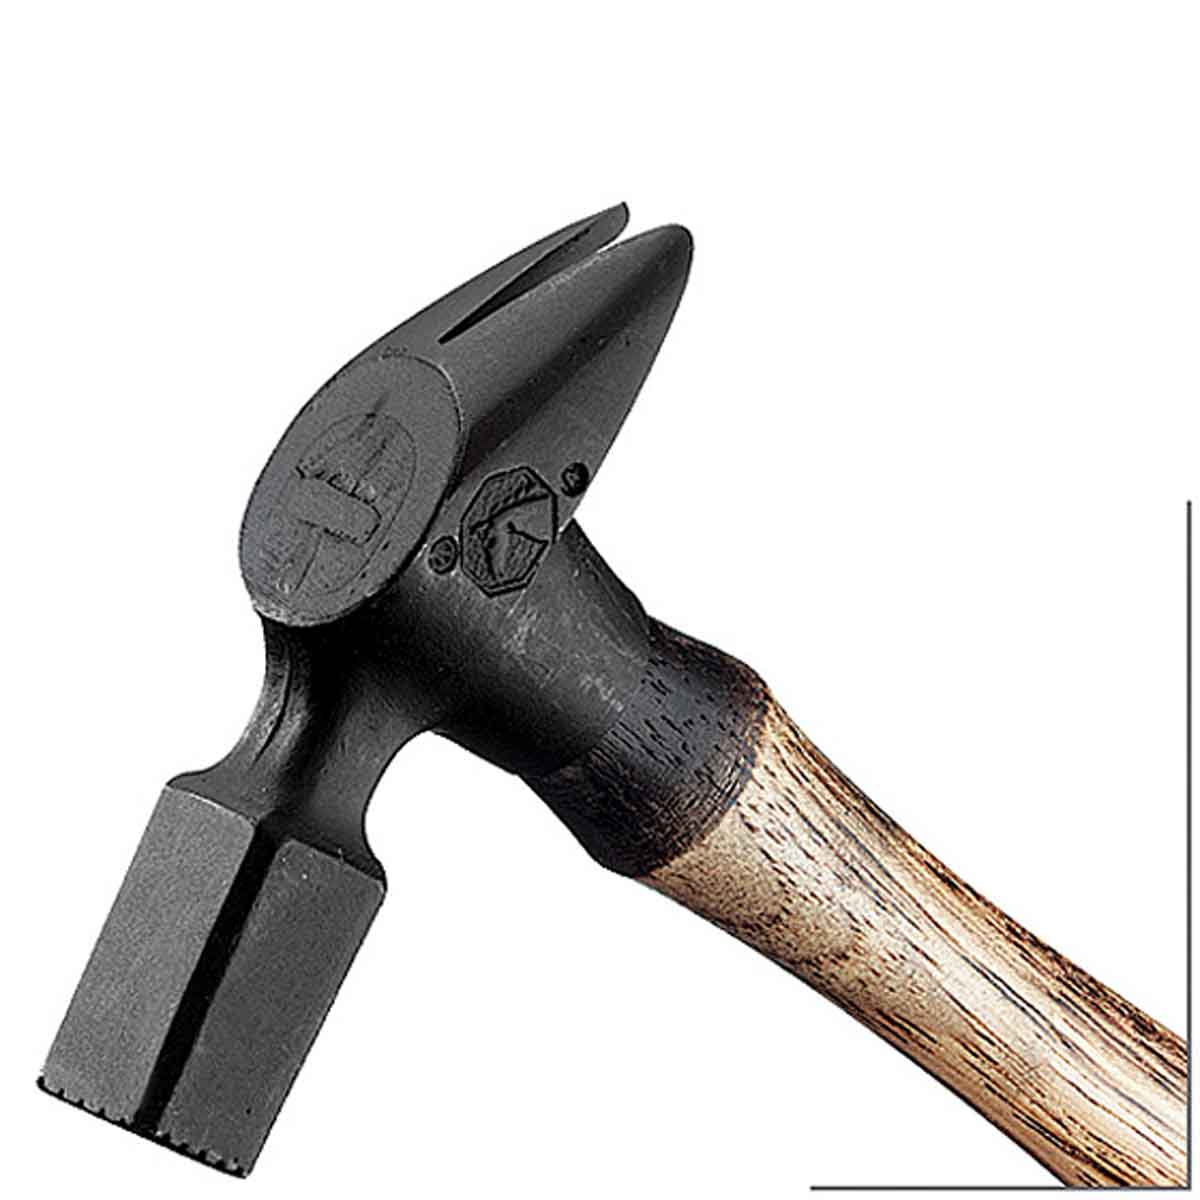 Horsehead Nailing Hammers